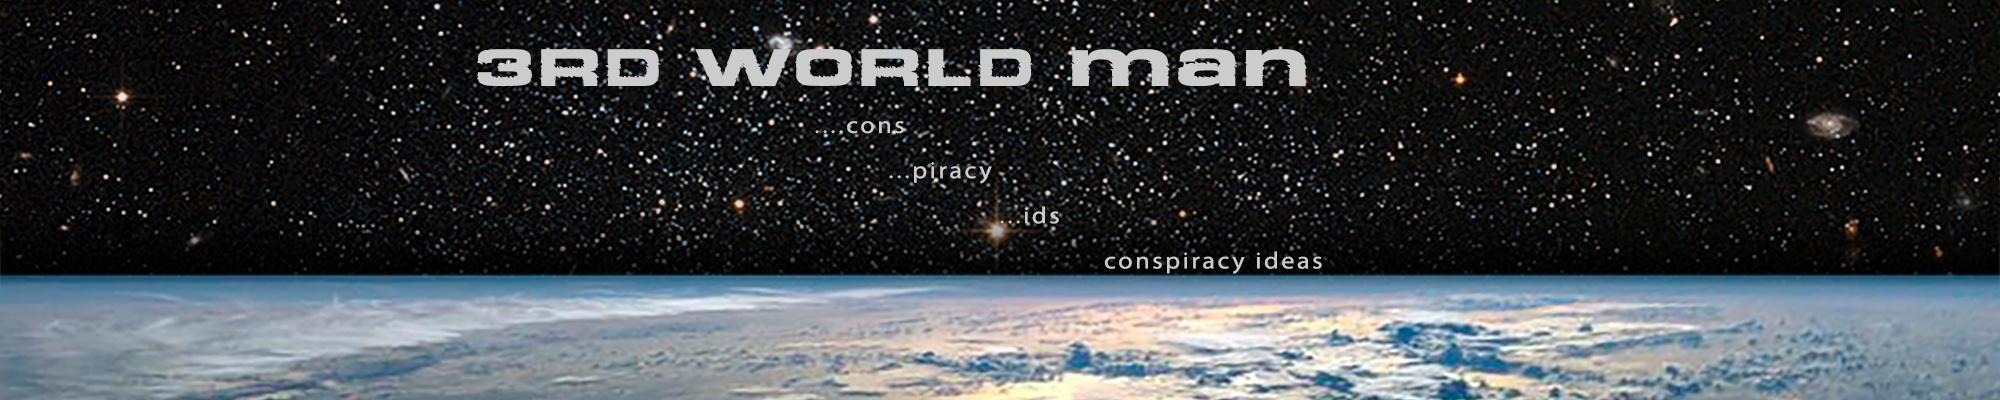 3rdworldman Cover